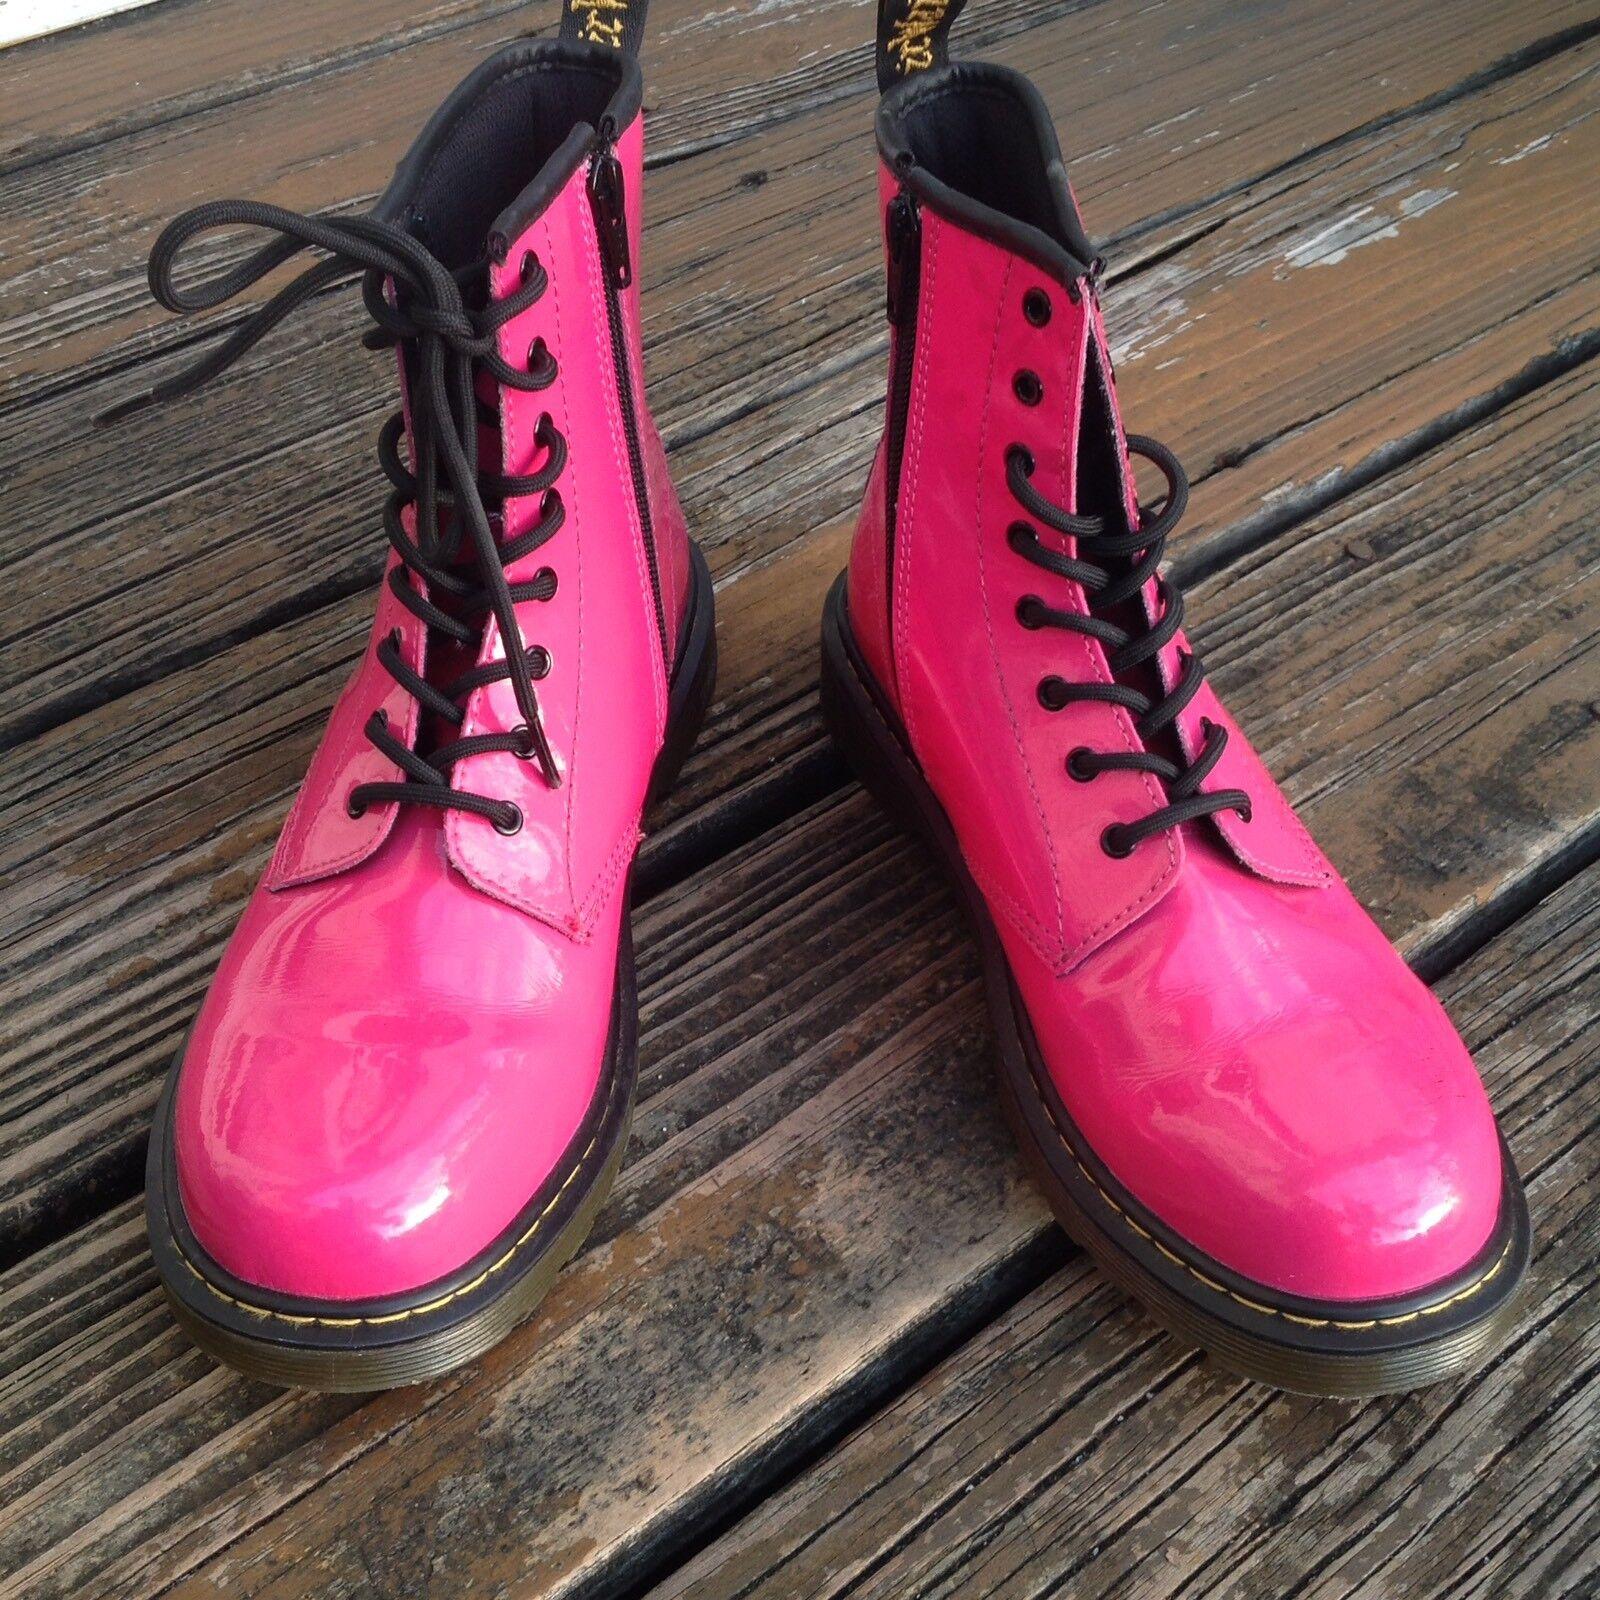 Dr Martens Docs Pink Patent Leather Combat Boots Womens 7 UK 5 EUR 38 1460 shoes